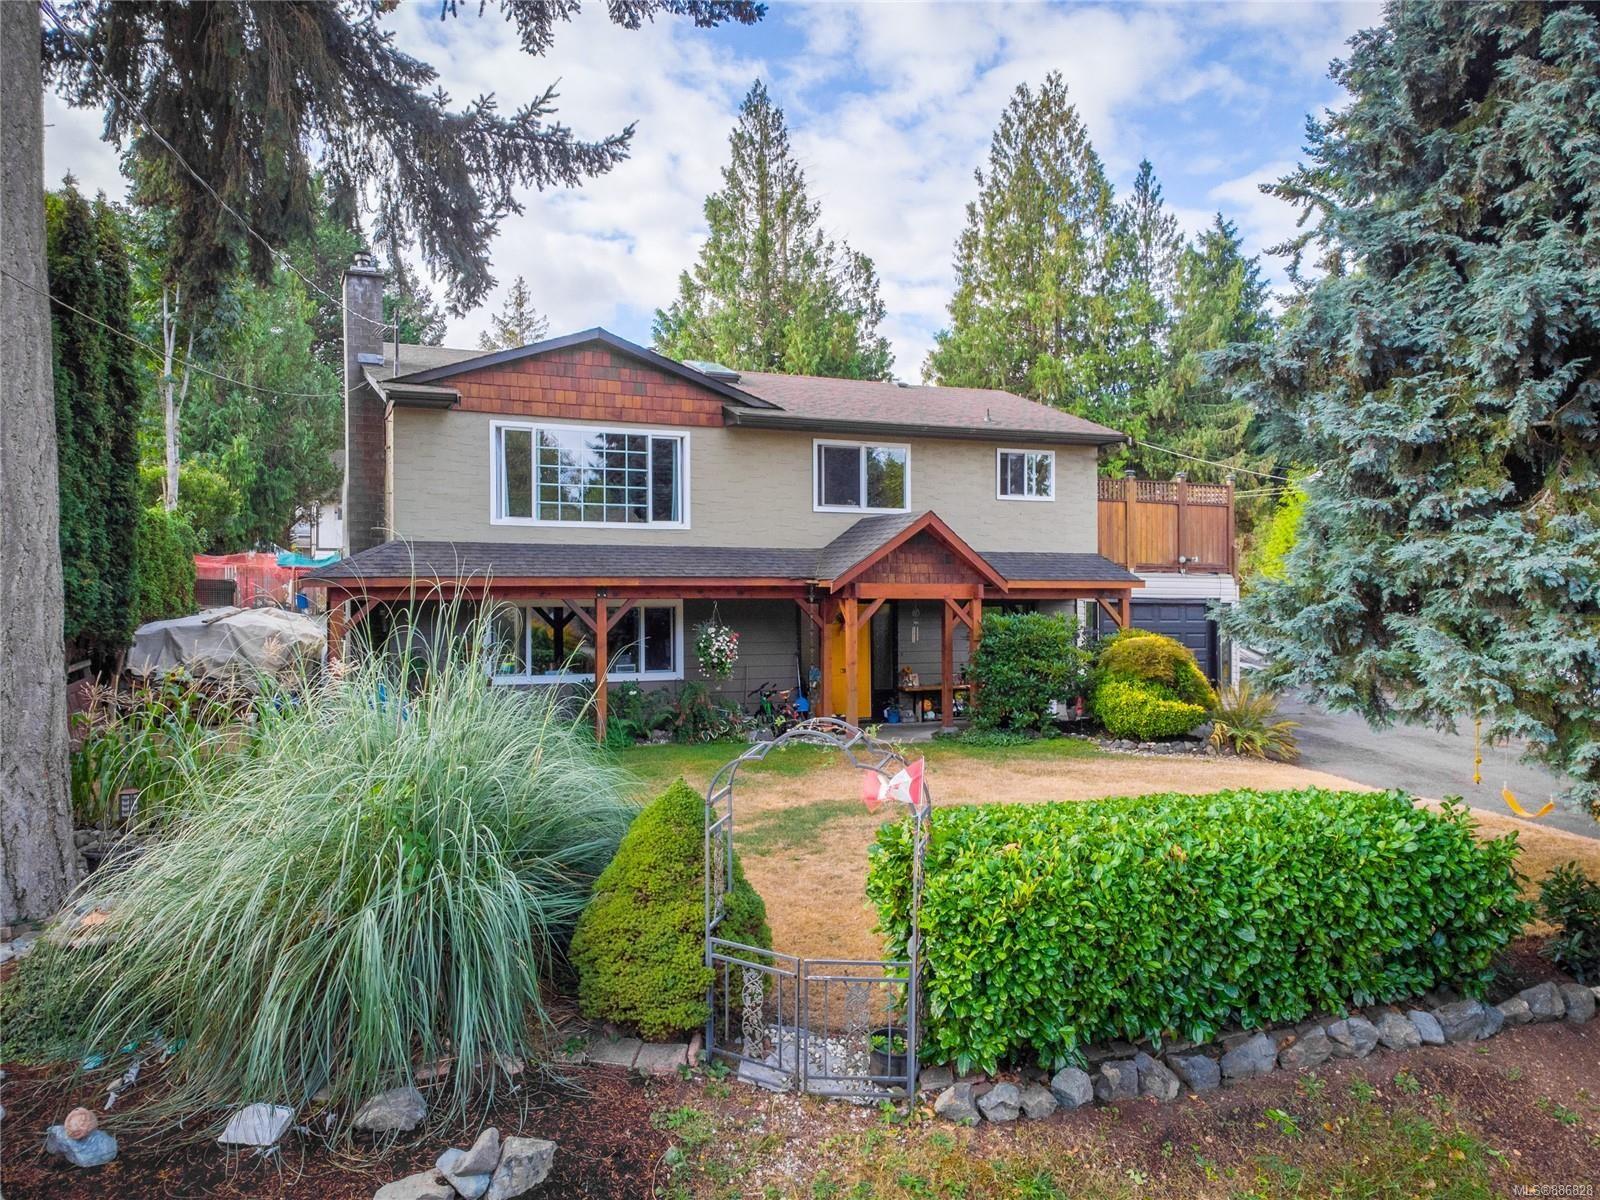 Main Photo: 7305 Lynn Dr in Lantzville: Na Lower Lantzville House for sale (Nanaimo)  : MLS®# 886828